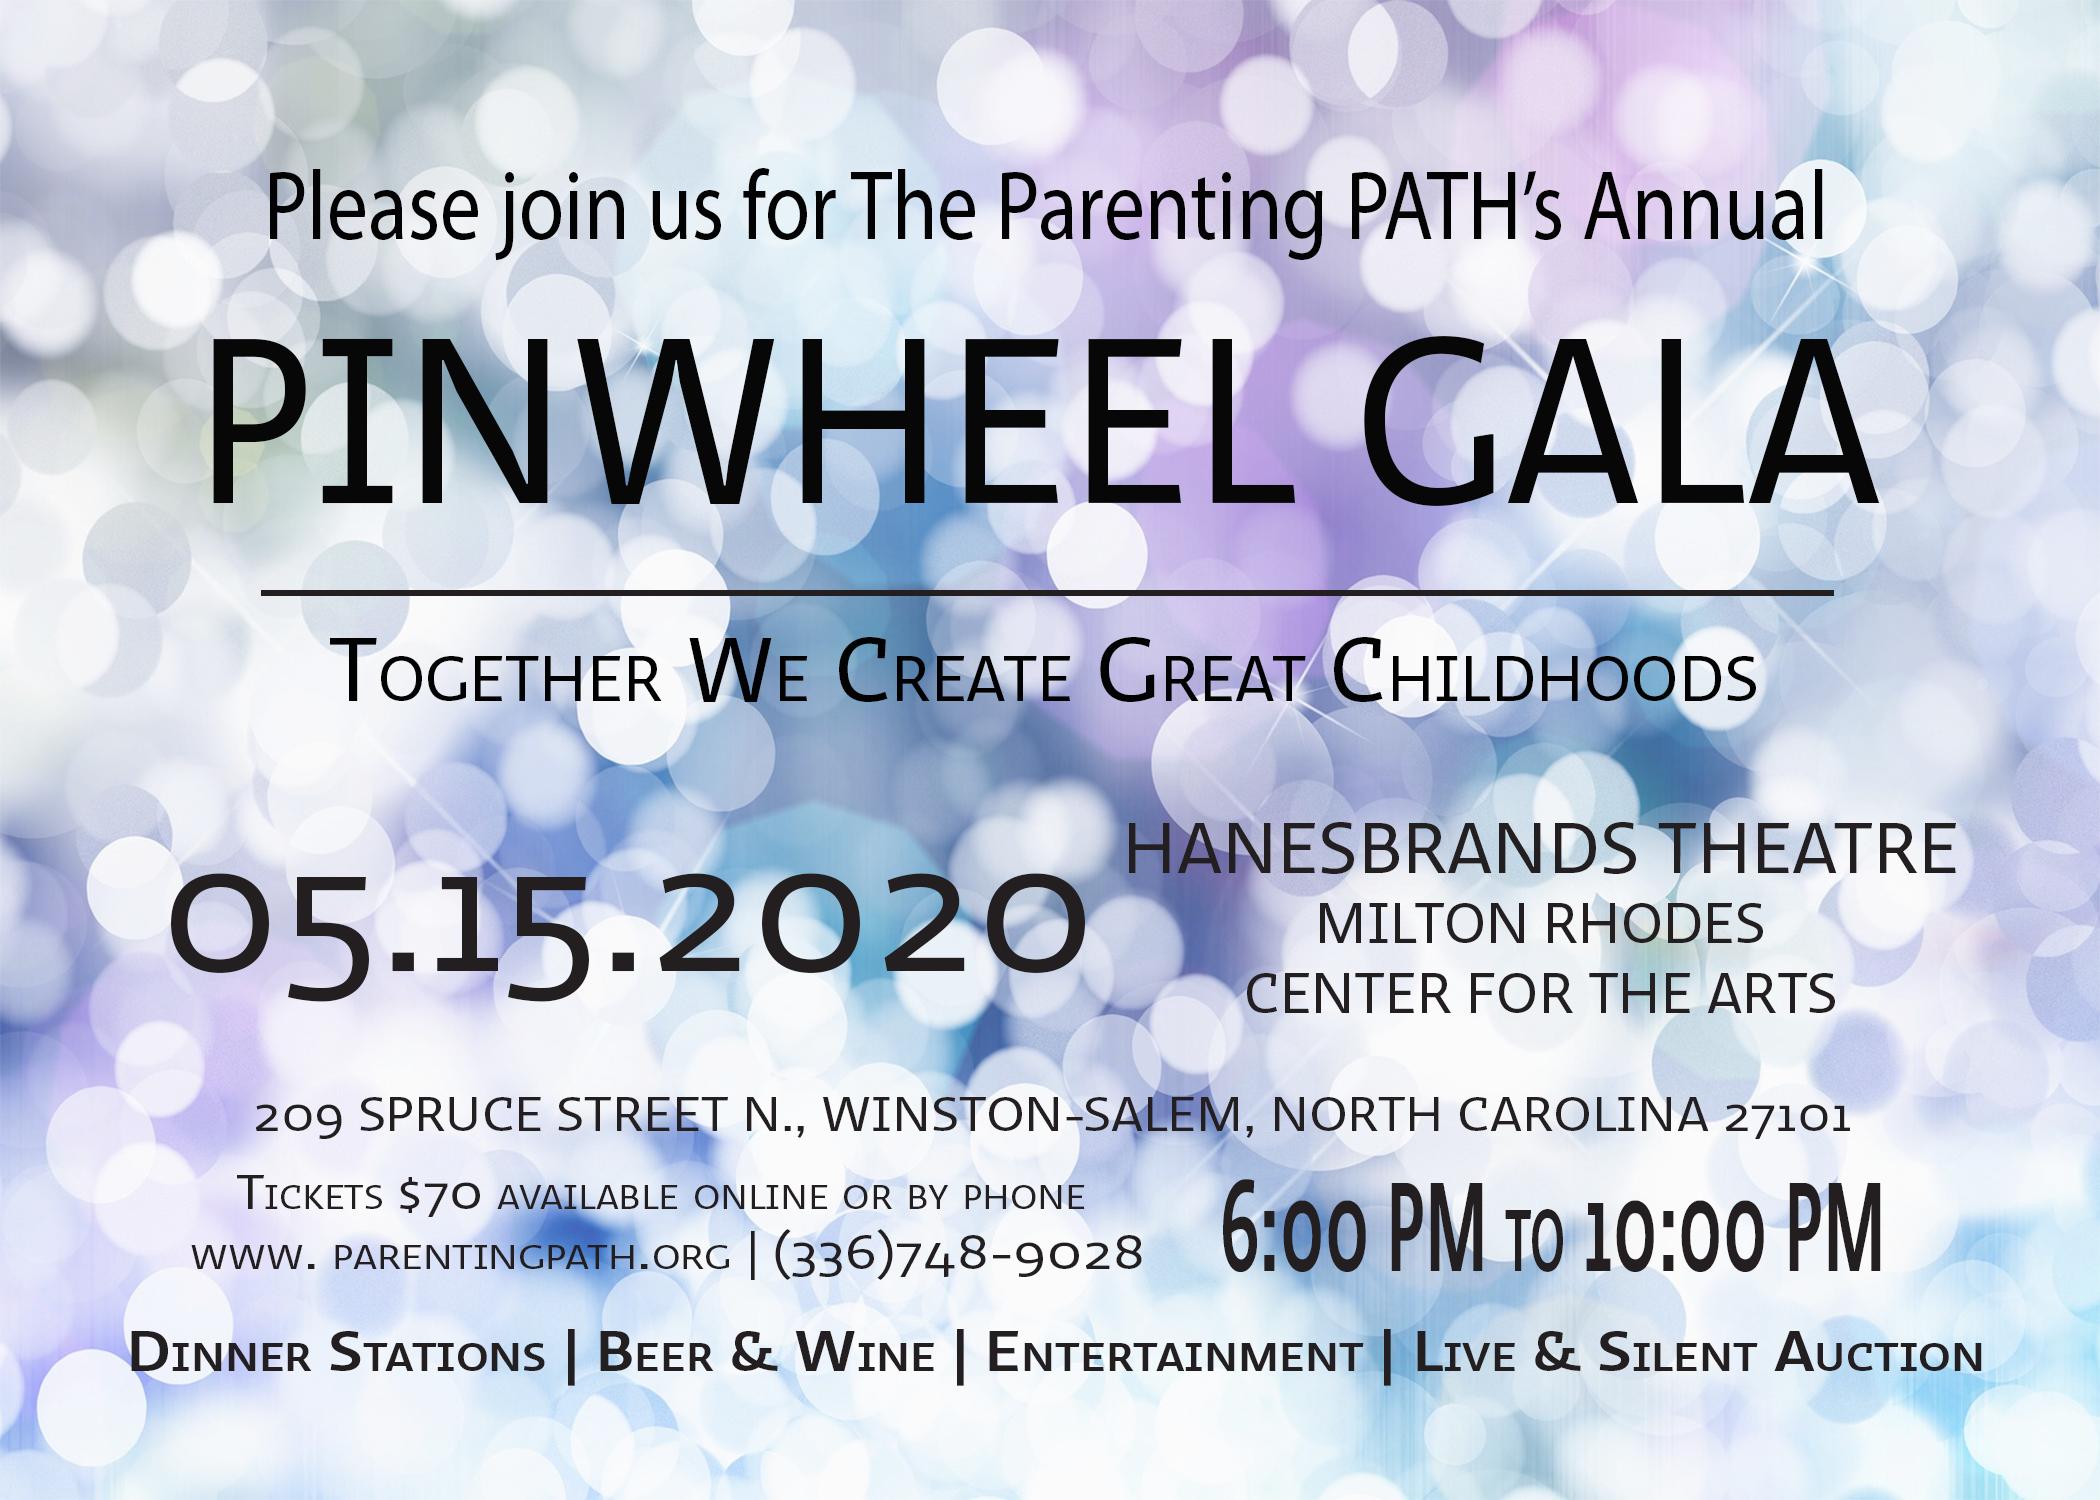 Annual Pinwheel Gala